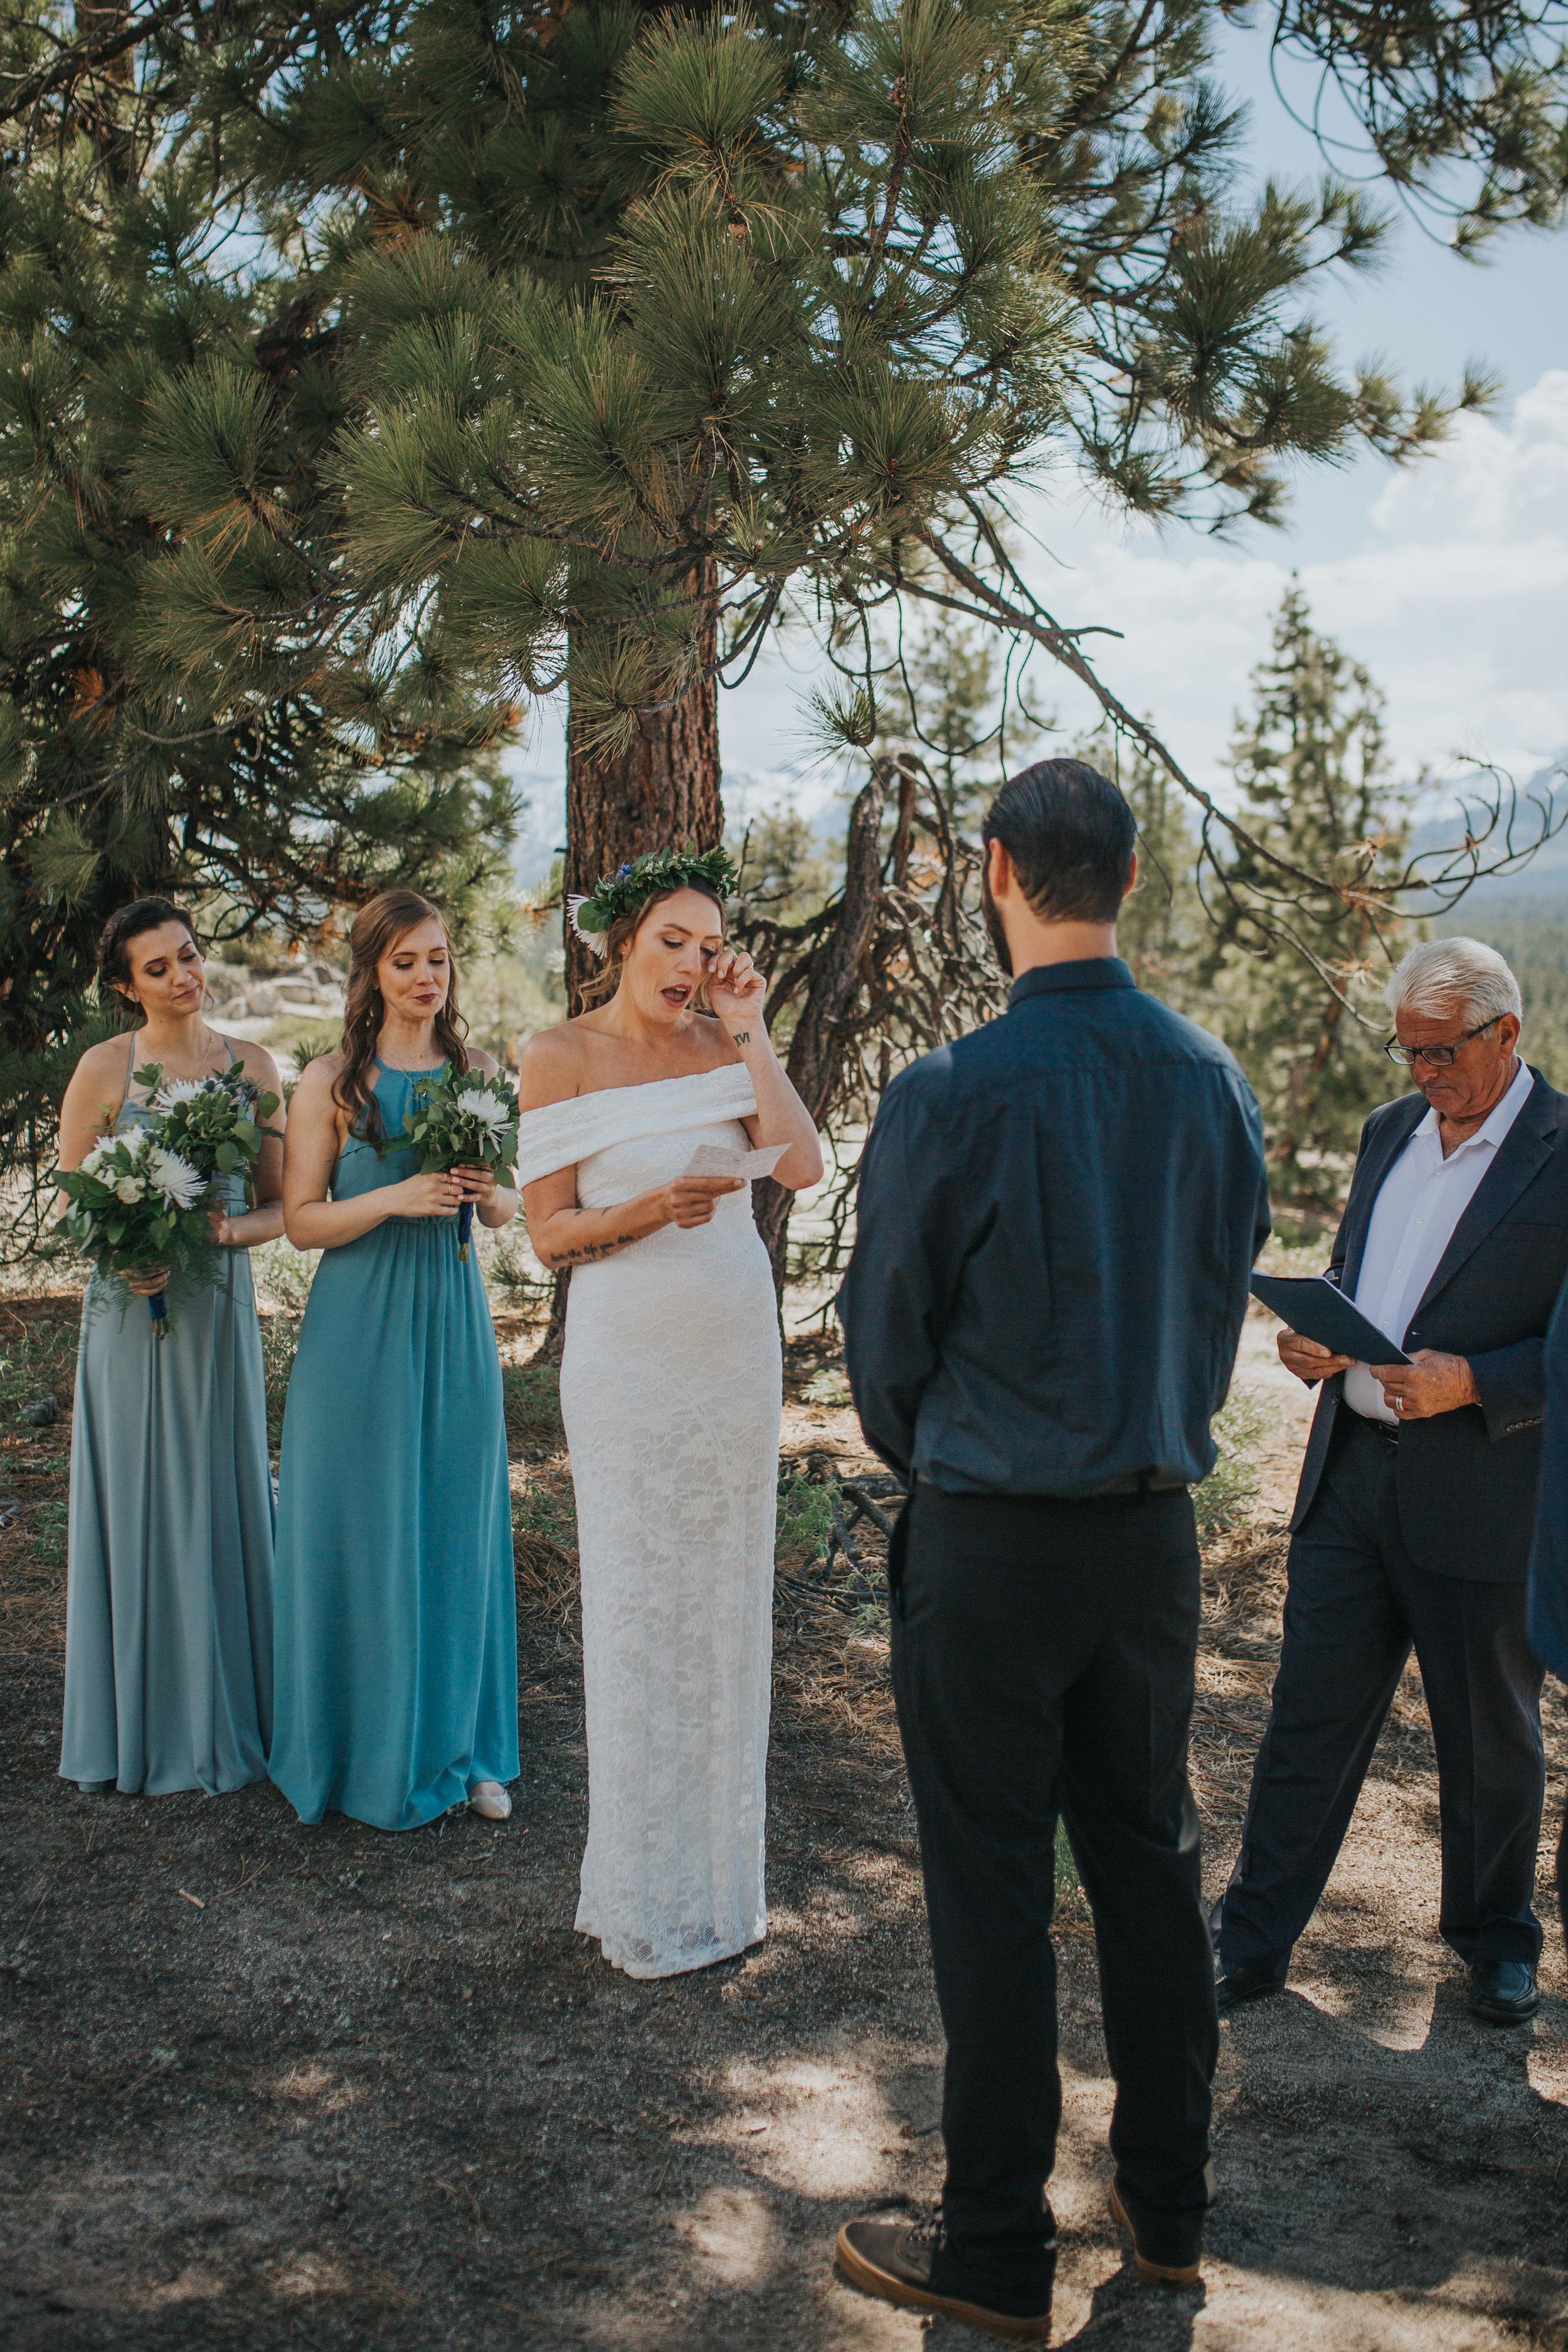 south-lake-tahoe-elopement-valerie-lendvay-photo-027.jpg